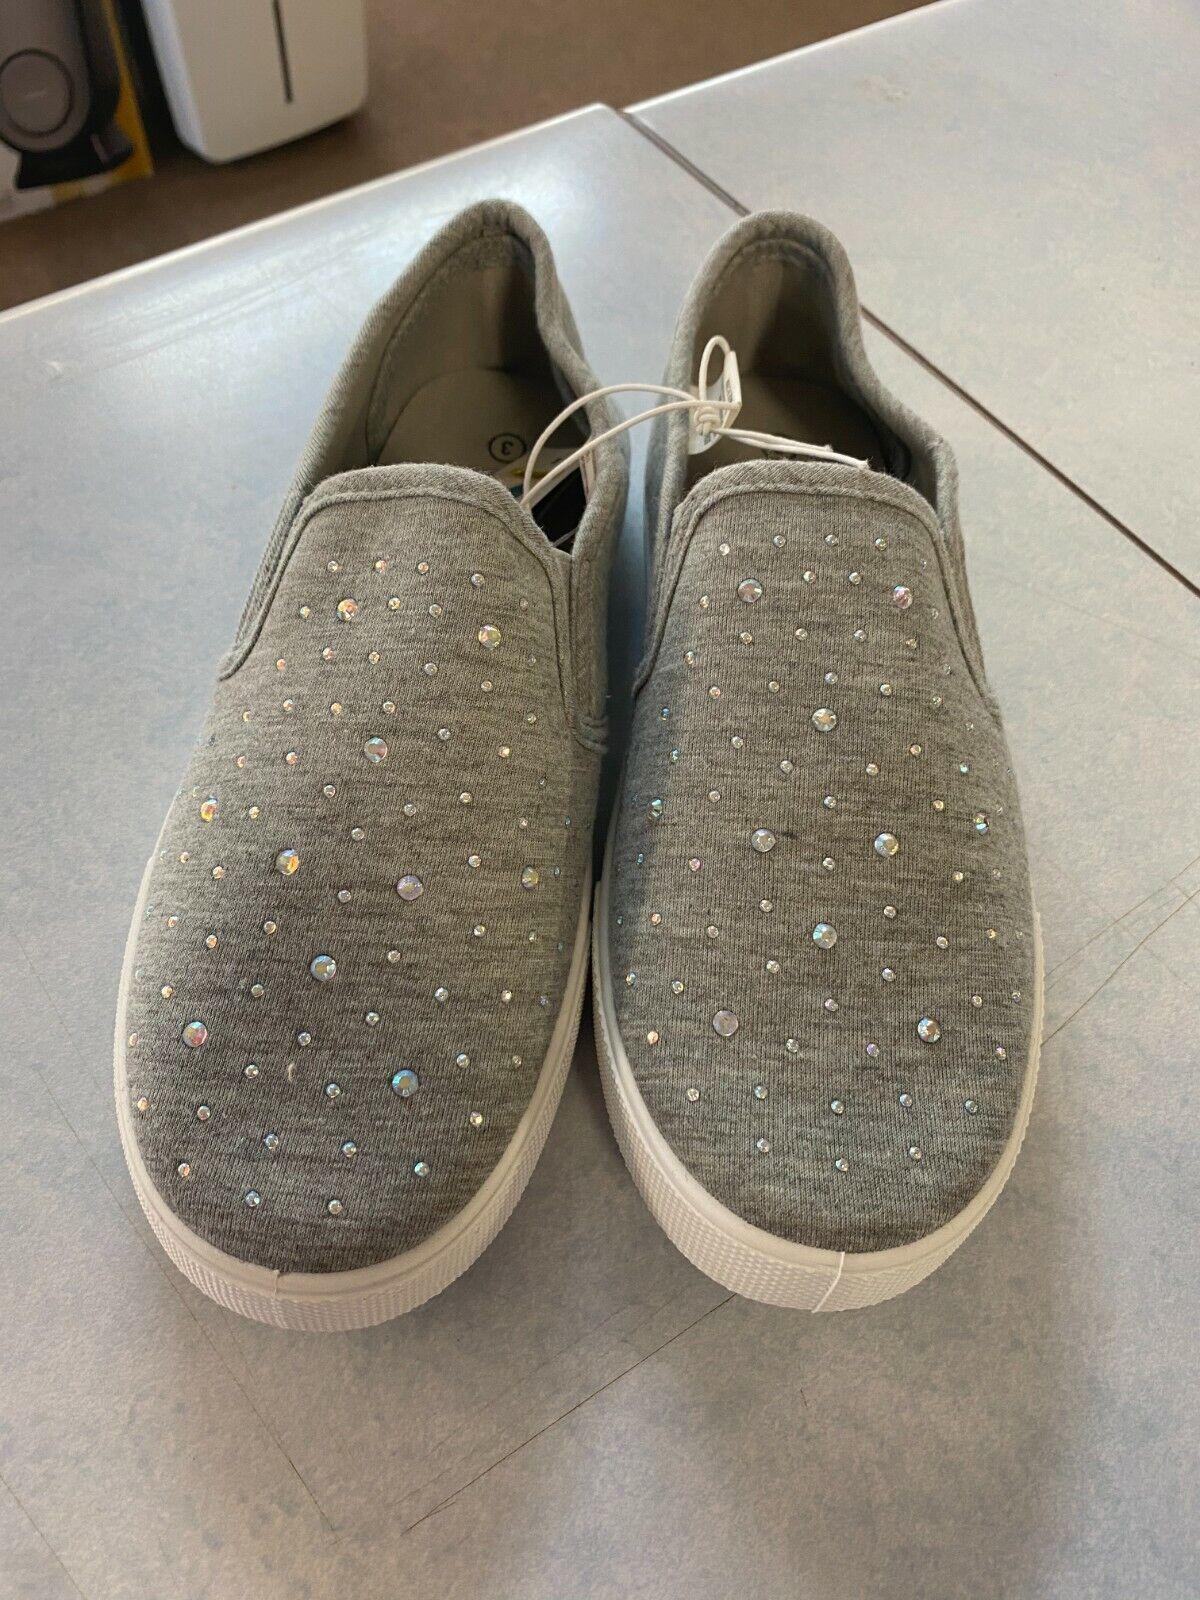 Bobbie Brooks Girl/'s Gray Studded Casual Slip-On Shoes Bin #17